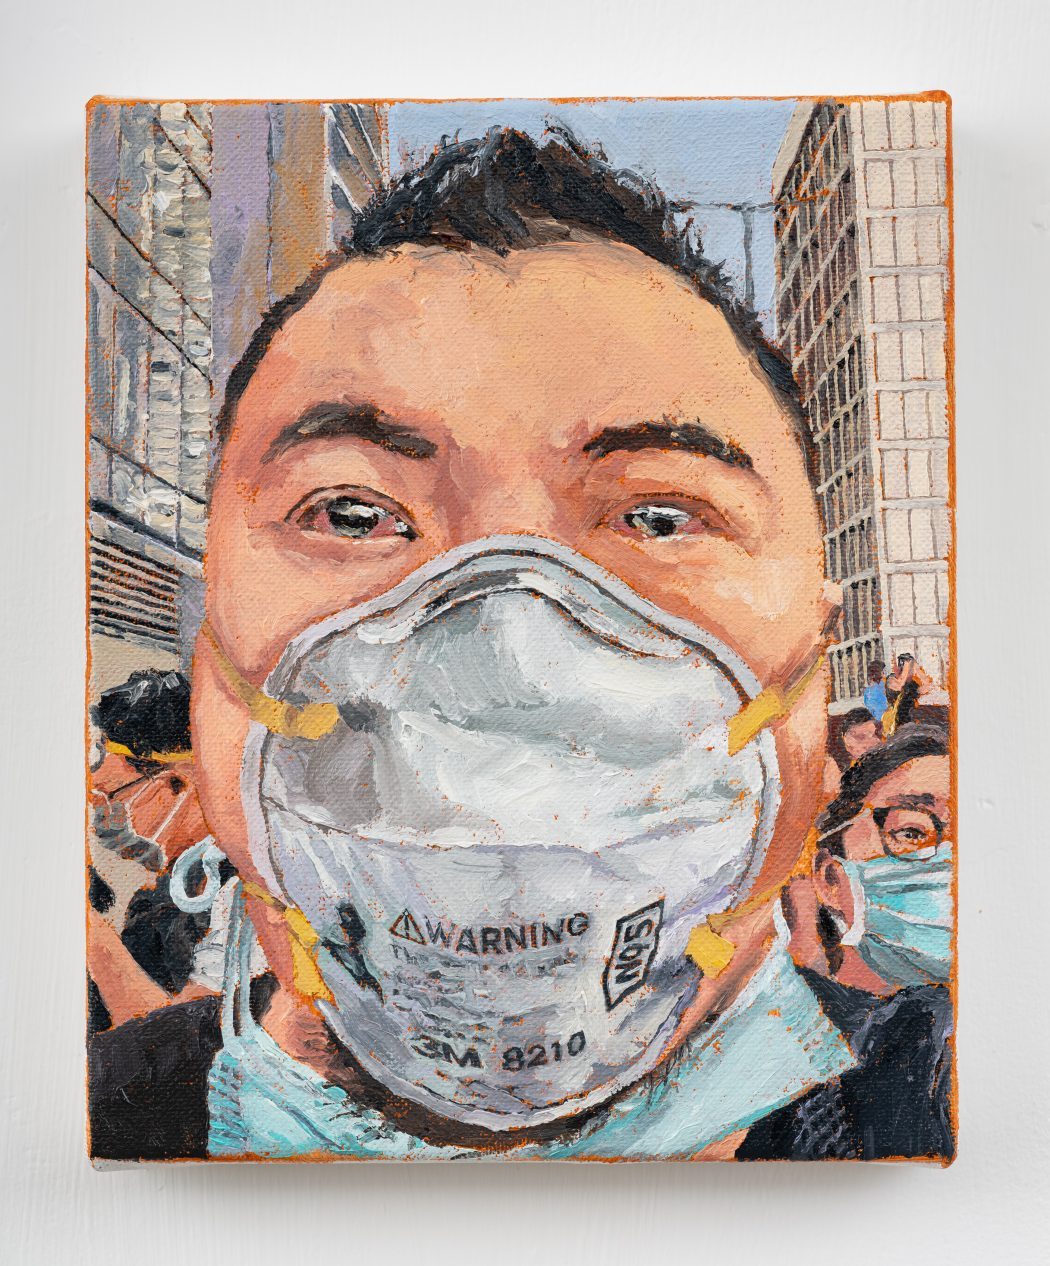 HKFP Lens Chow Chun-fai protest